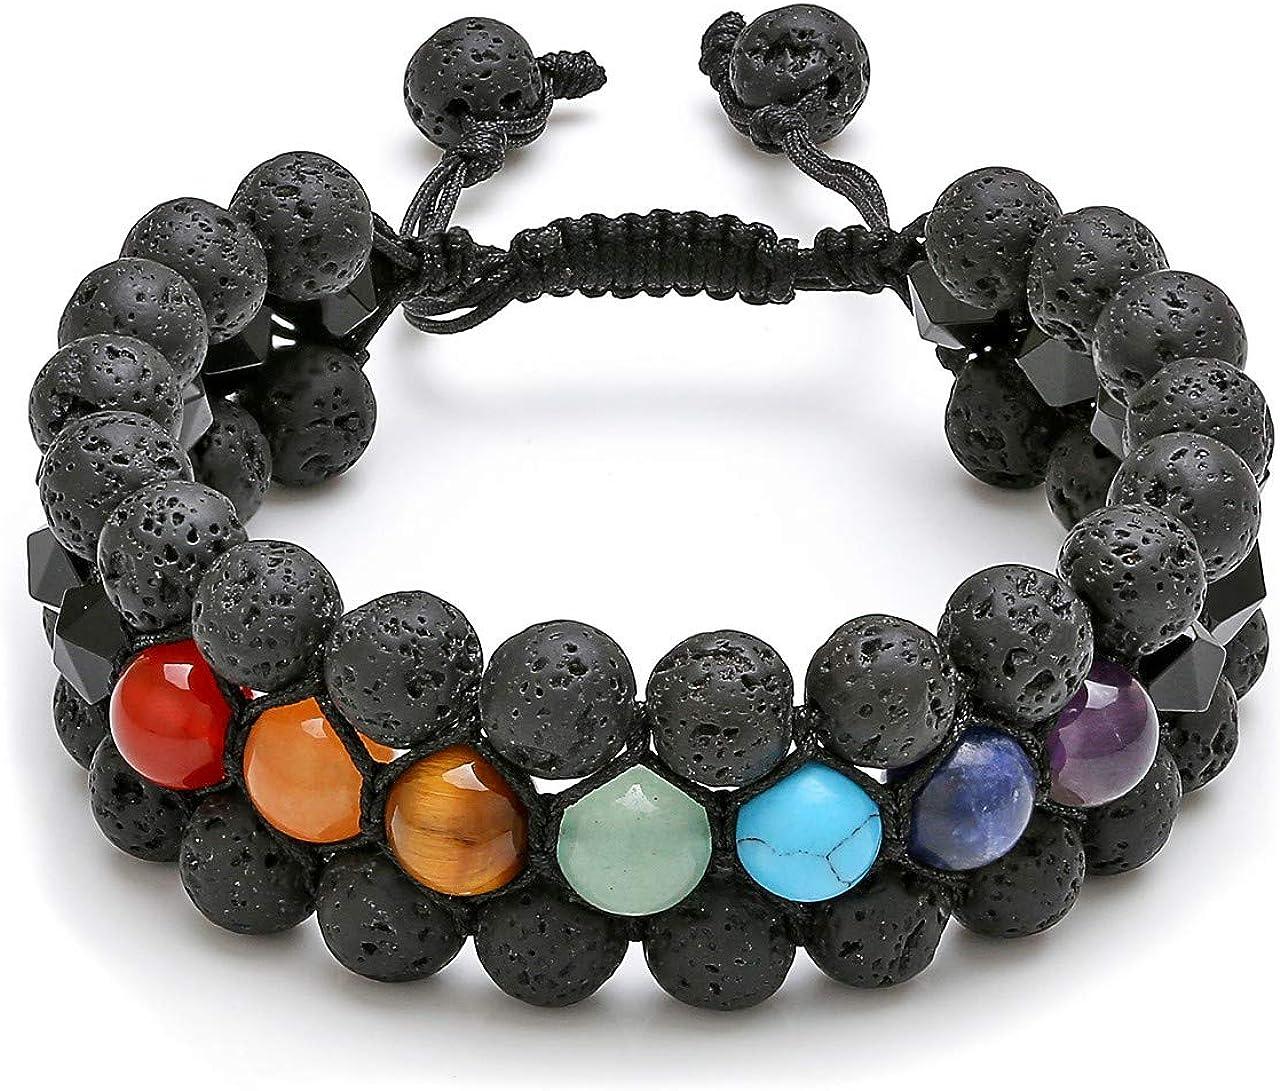 Jovivi Beads Chakra Bracelet Tigers Eye Gemstone Black Onyx Obsidian Lava Rock Stone Essential Oil Diffuser Bracelet Natural Energy Yoga Healing Crystals Bracelet Adjustble for Women Men